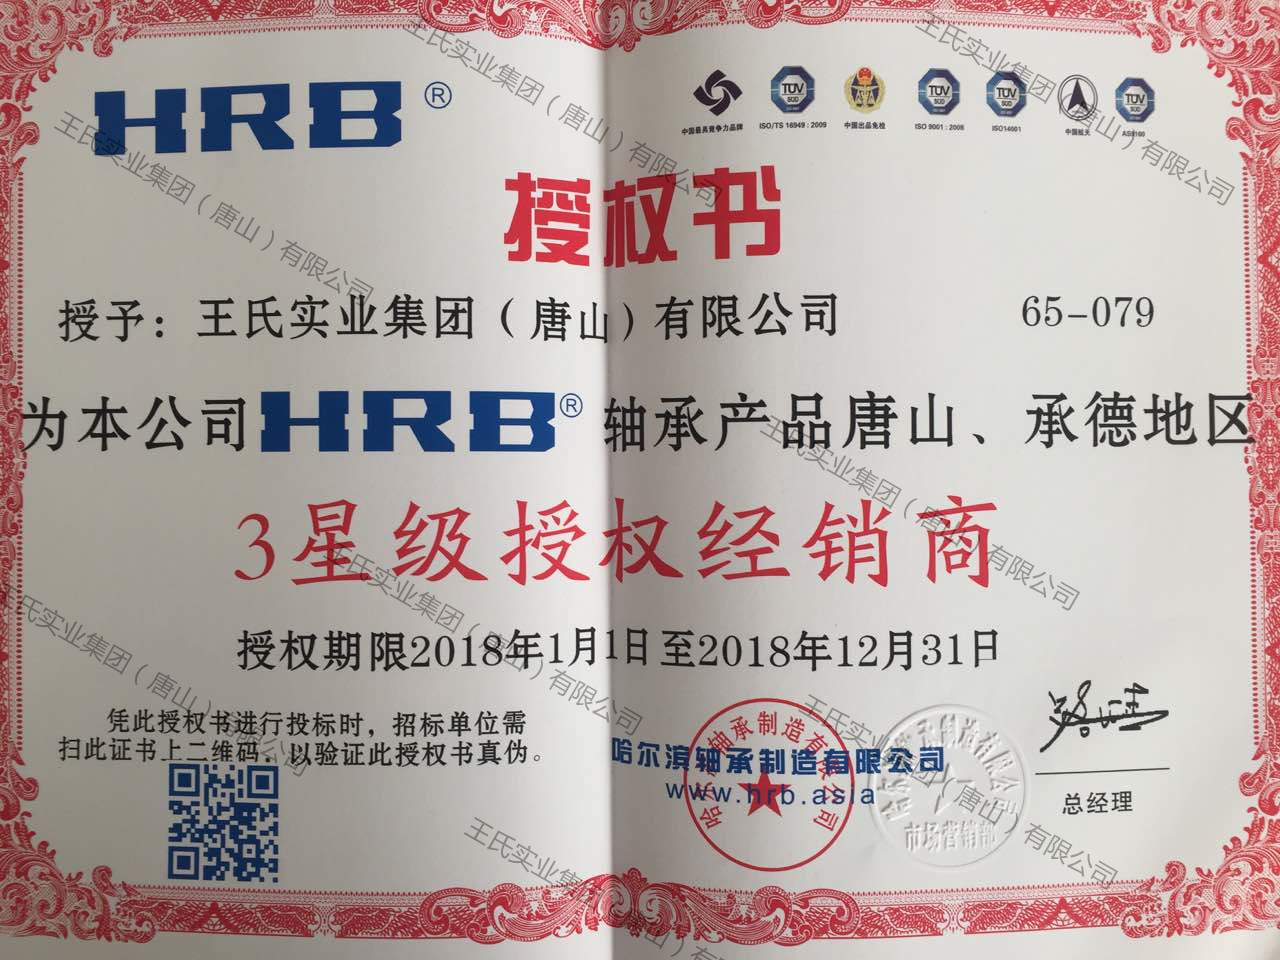 HRB2018授权书